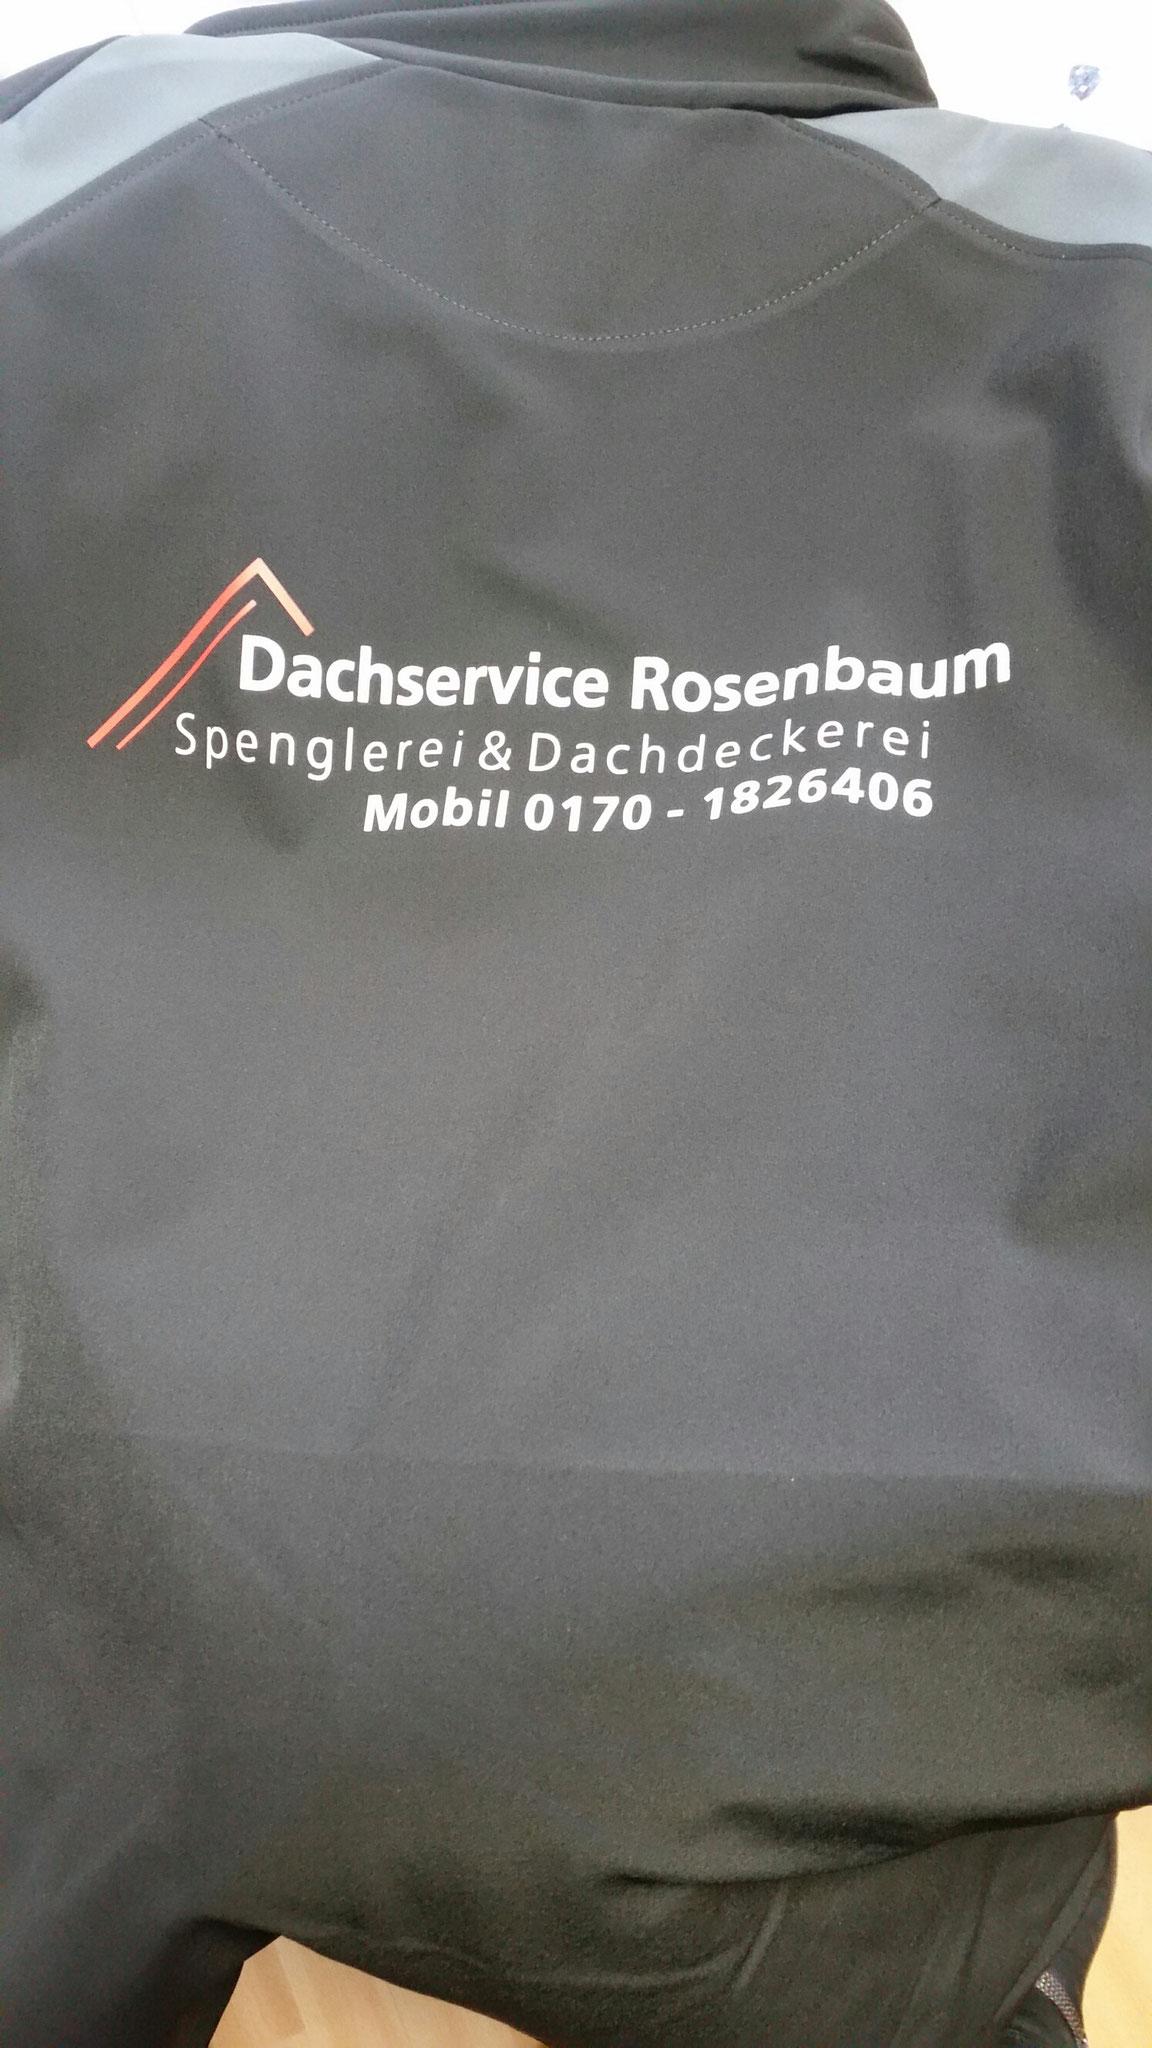 Softsheljacke Transferdruck Rücken 2-farbig